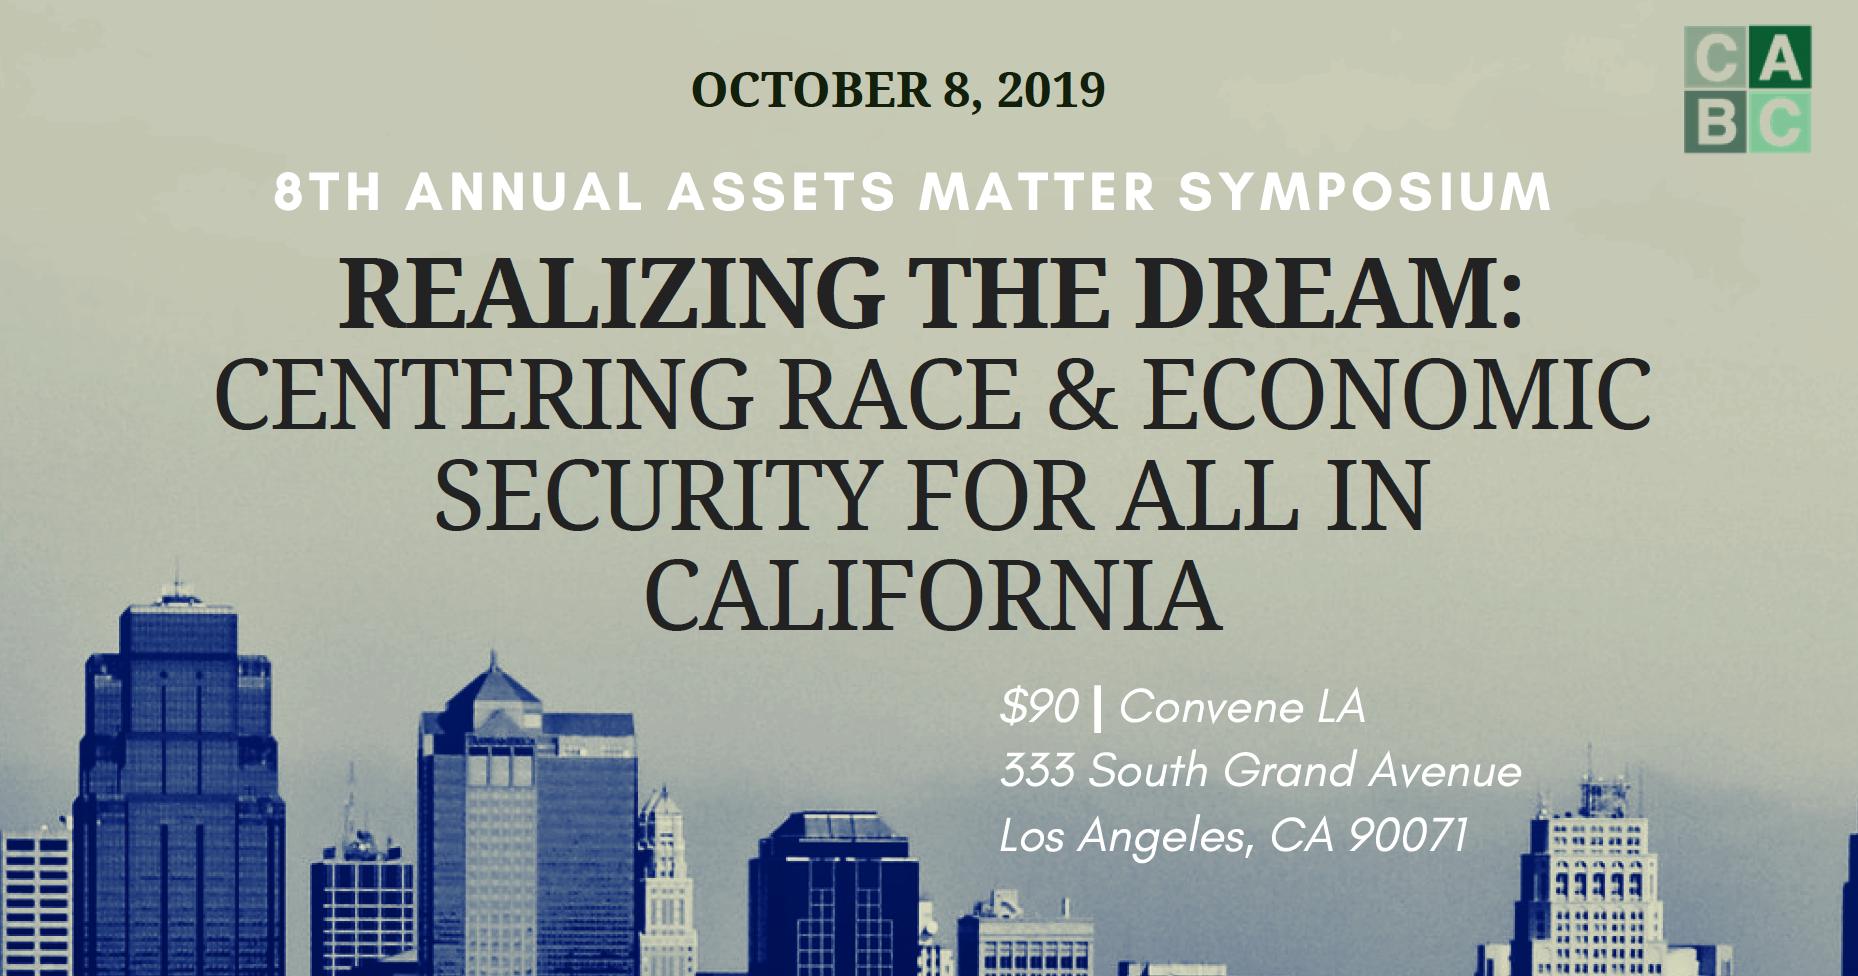 2019 Assets Matter Symposium